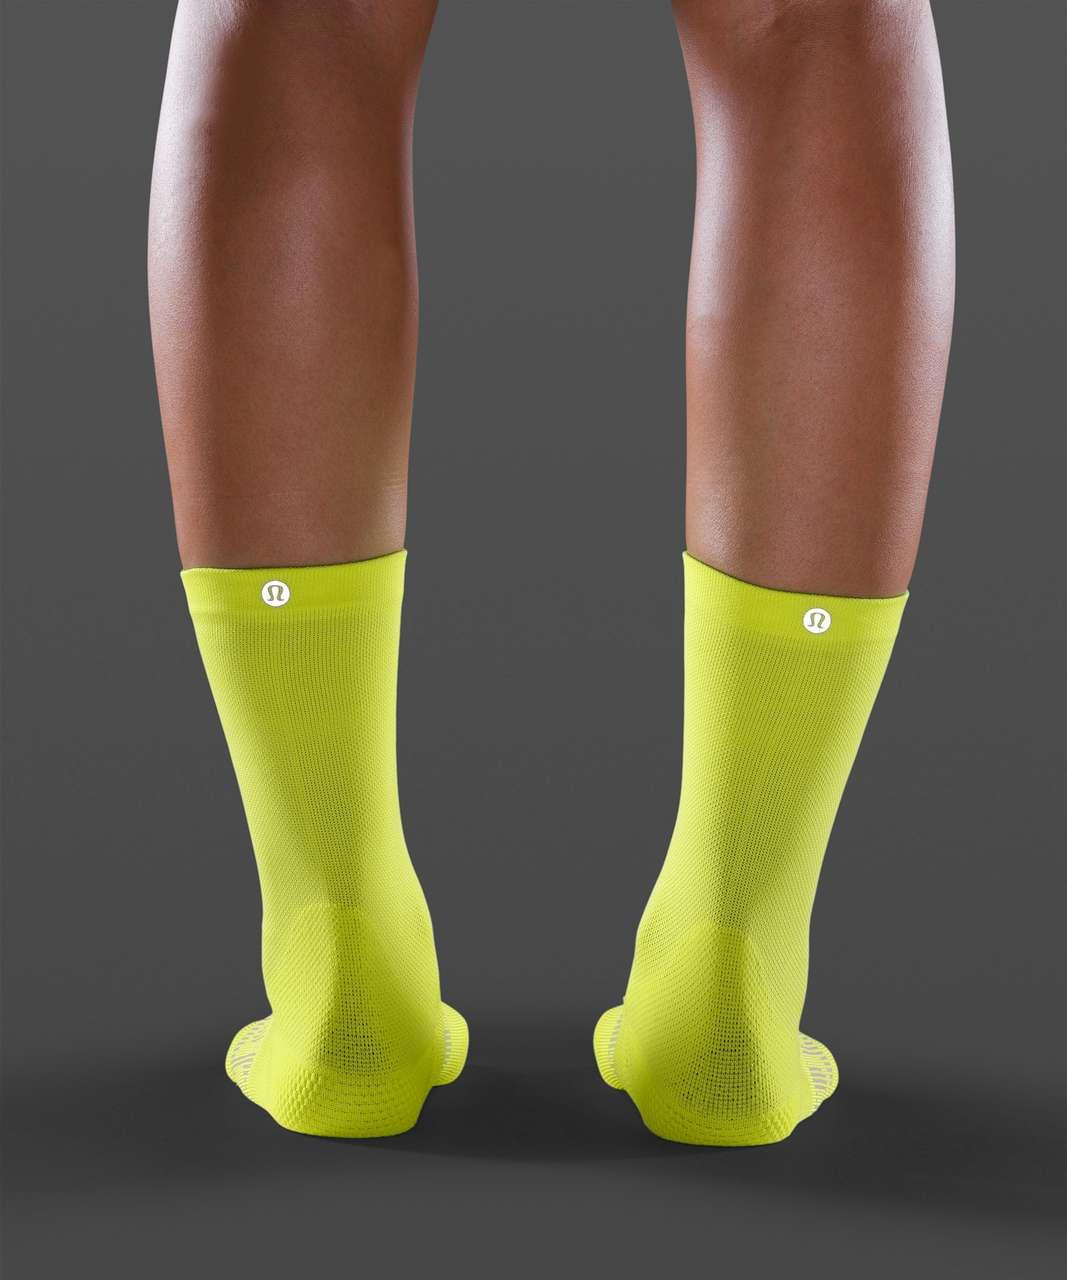 Lululemon Power Stride Crew Sock - Highlight Yellow